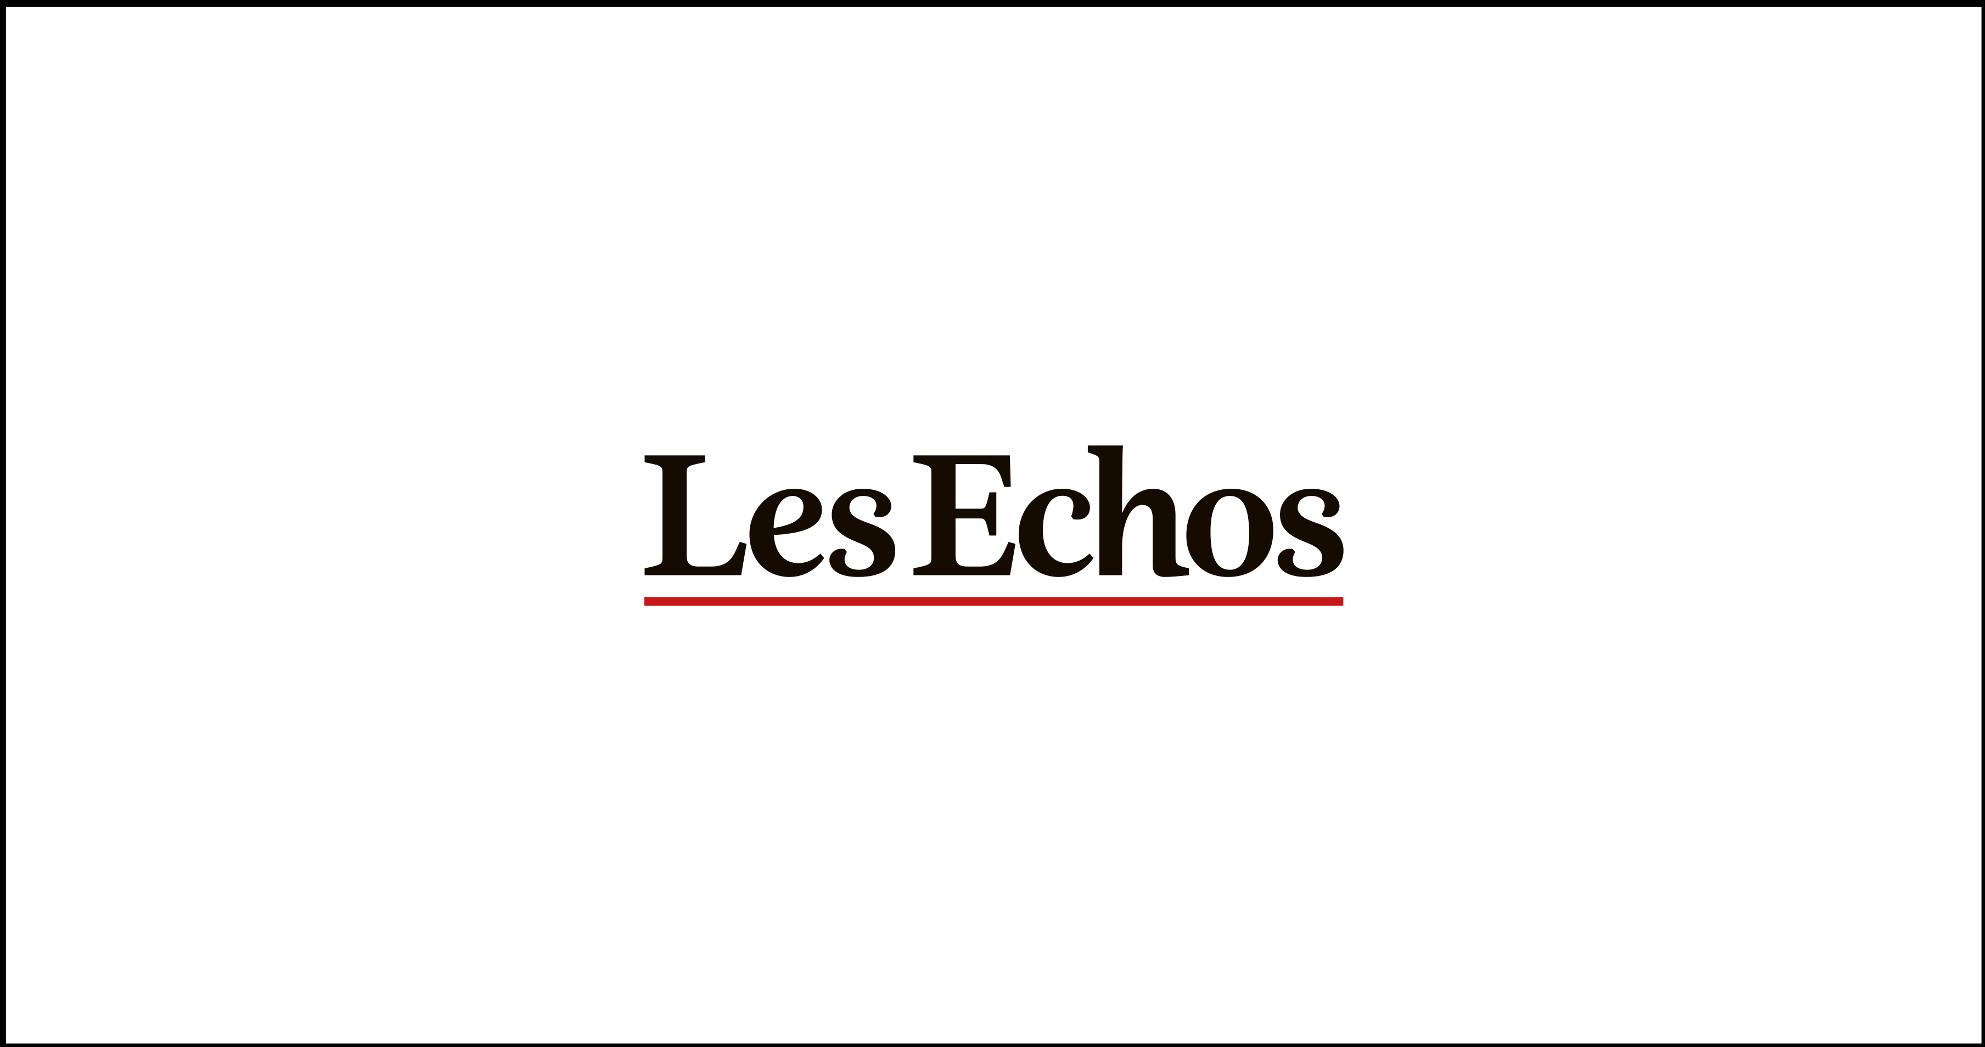 Invenis les Echos